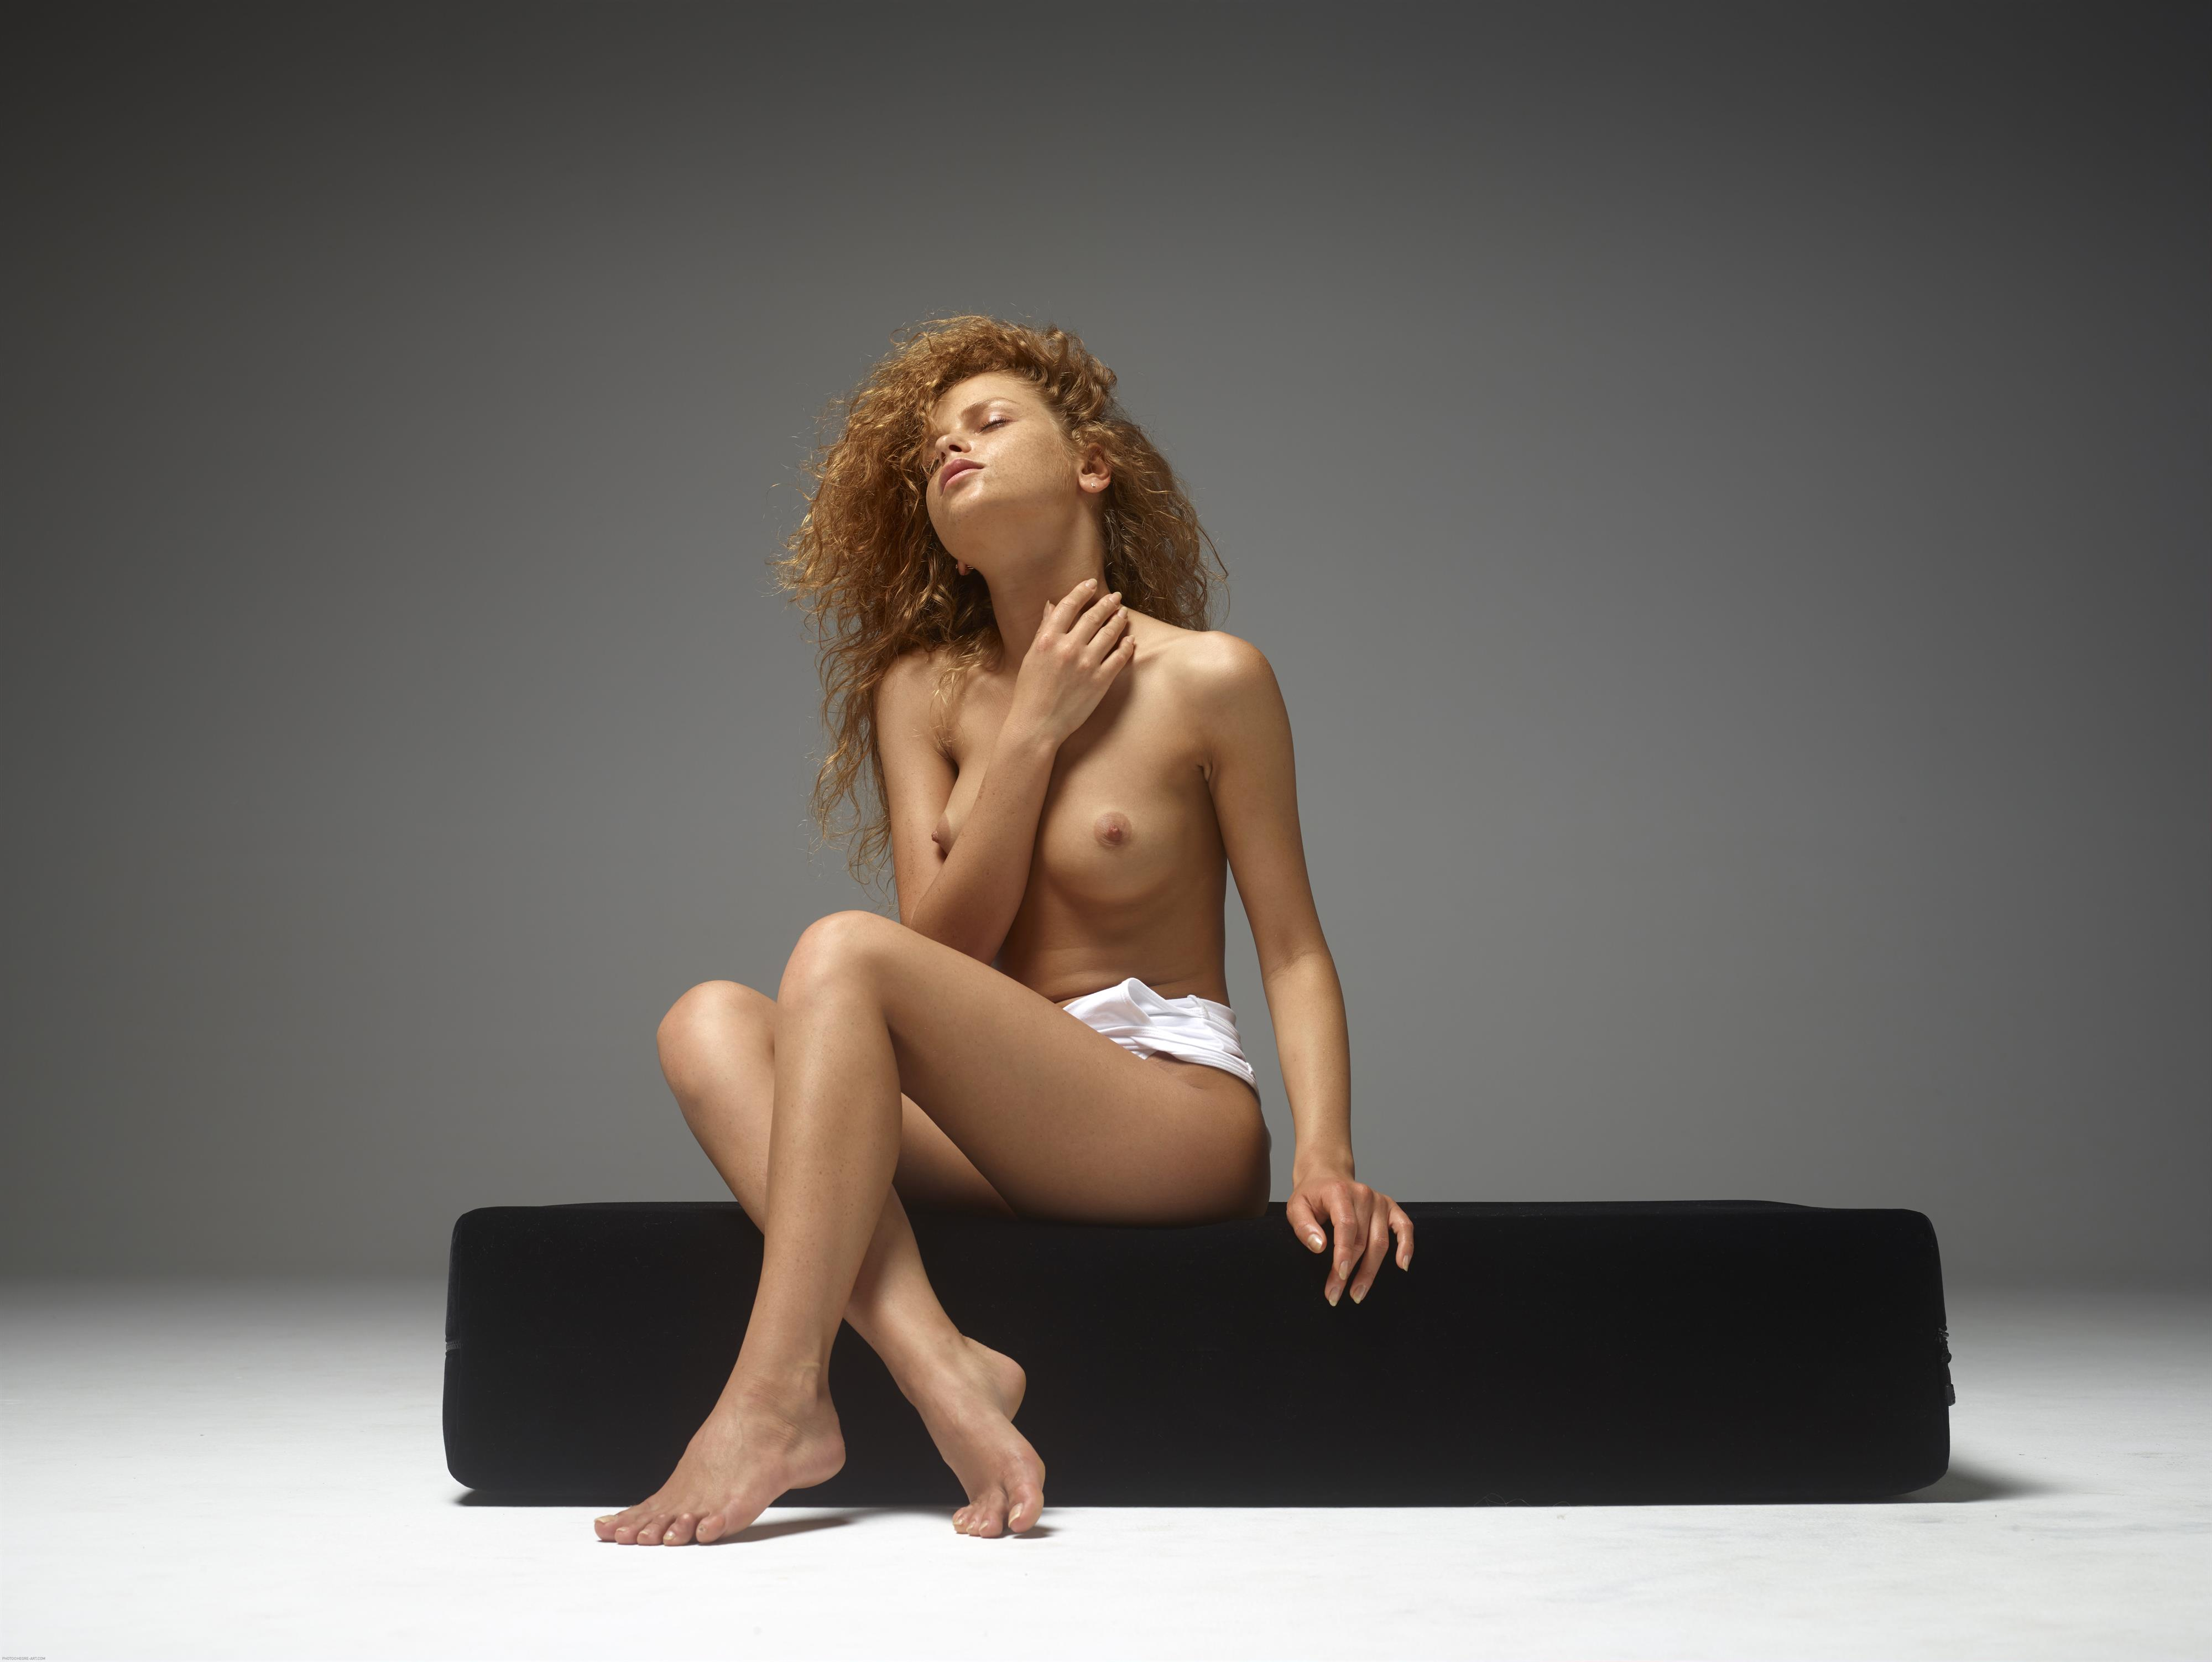 Julie white nude xxx free video